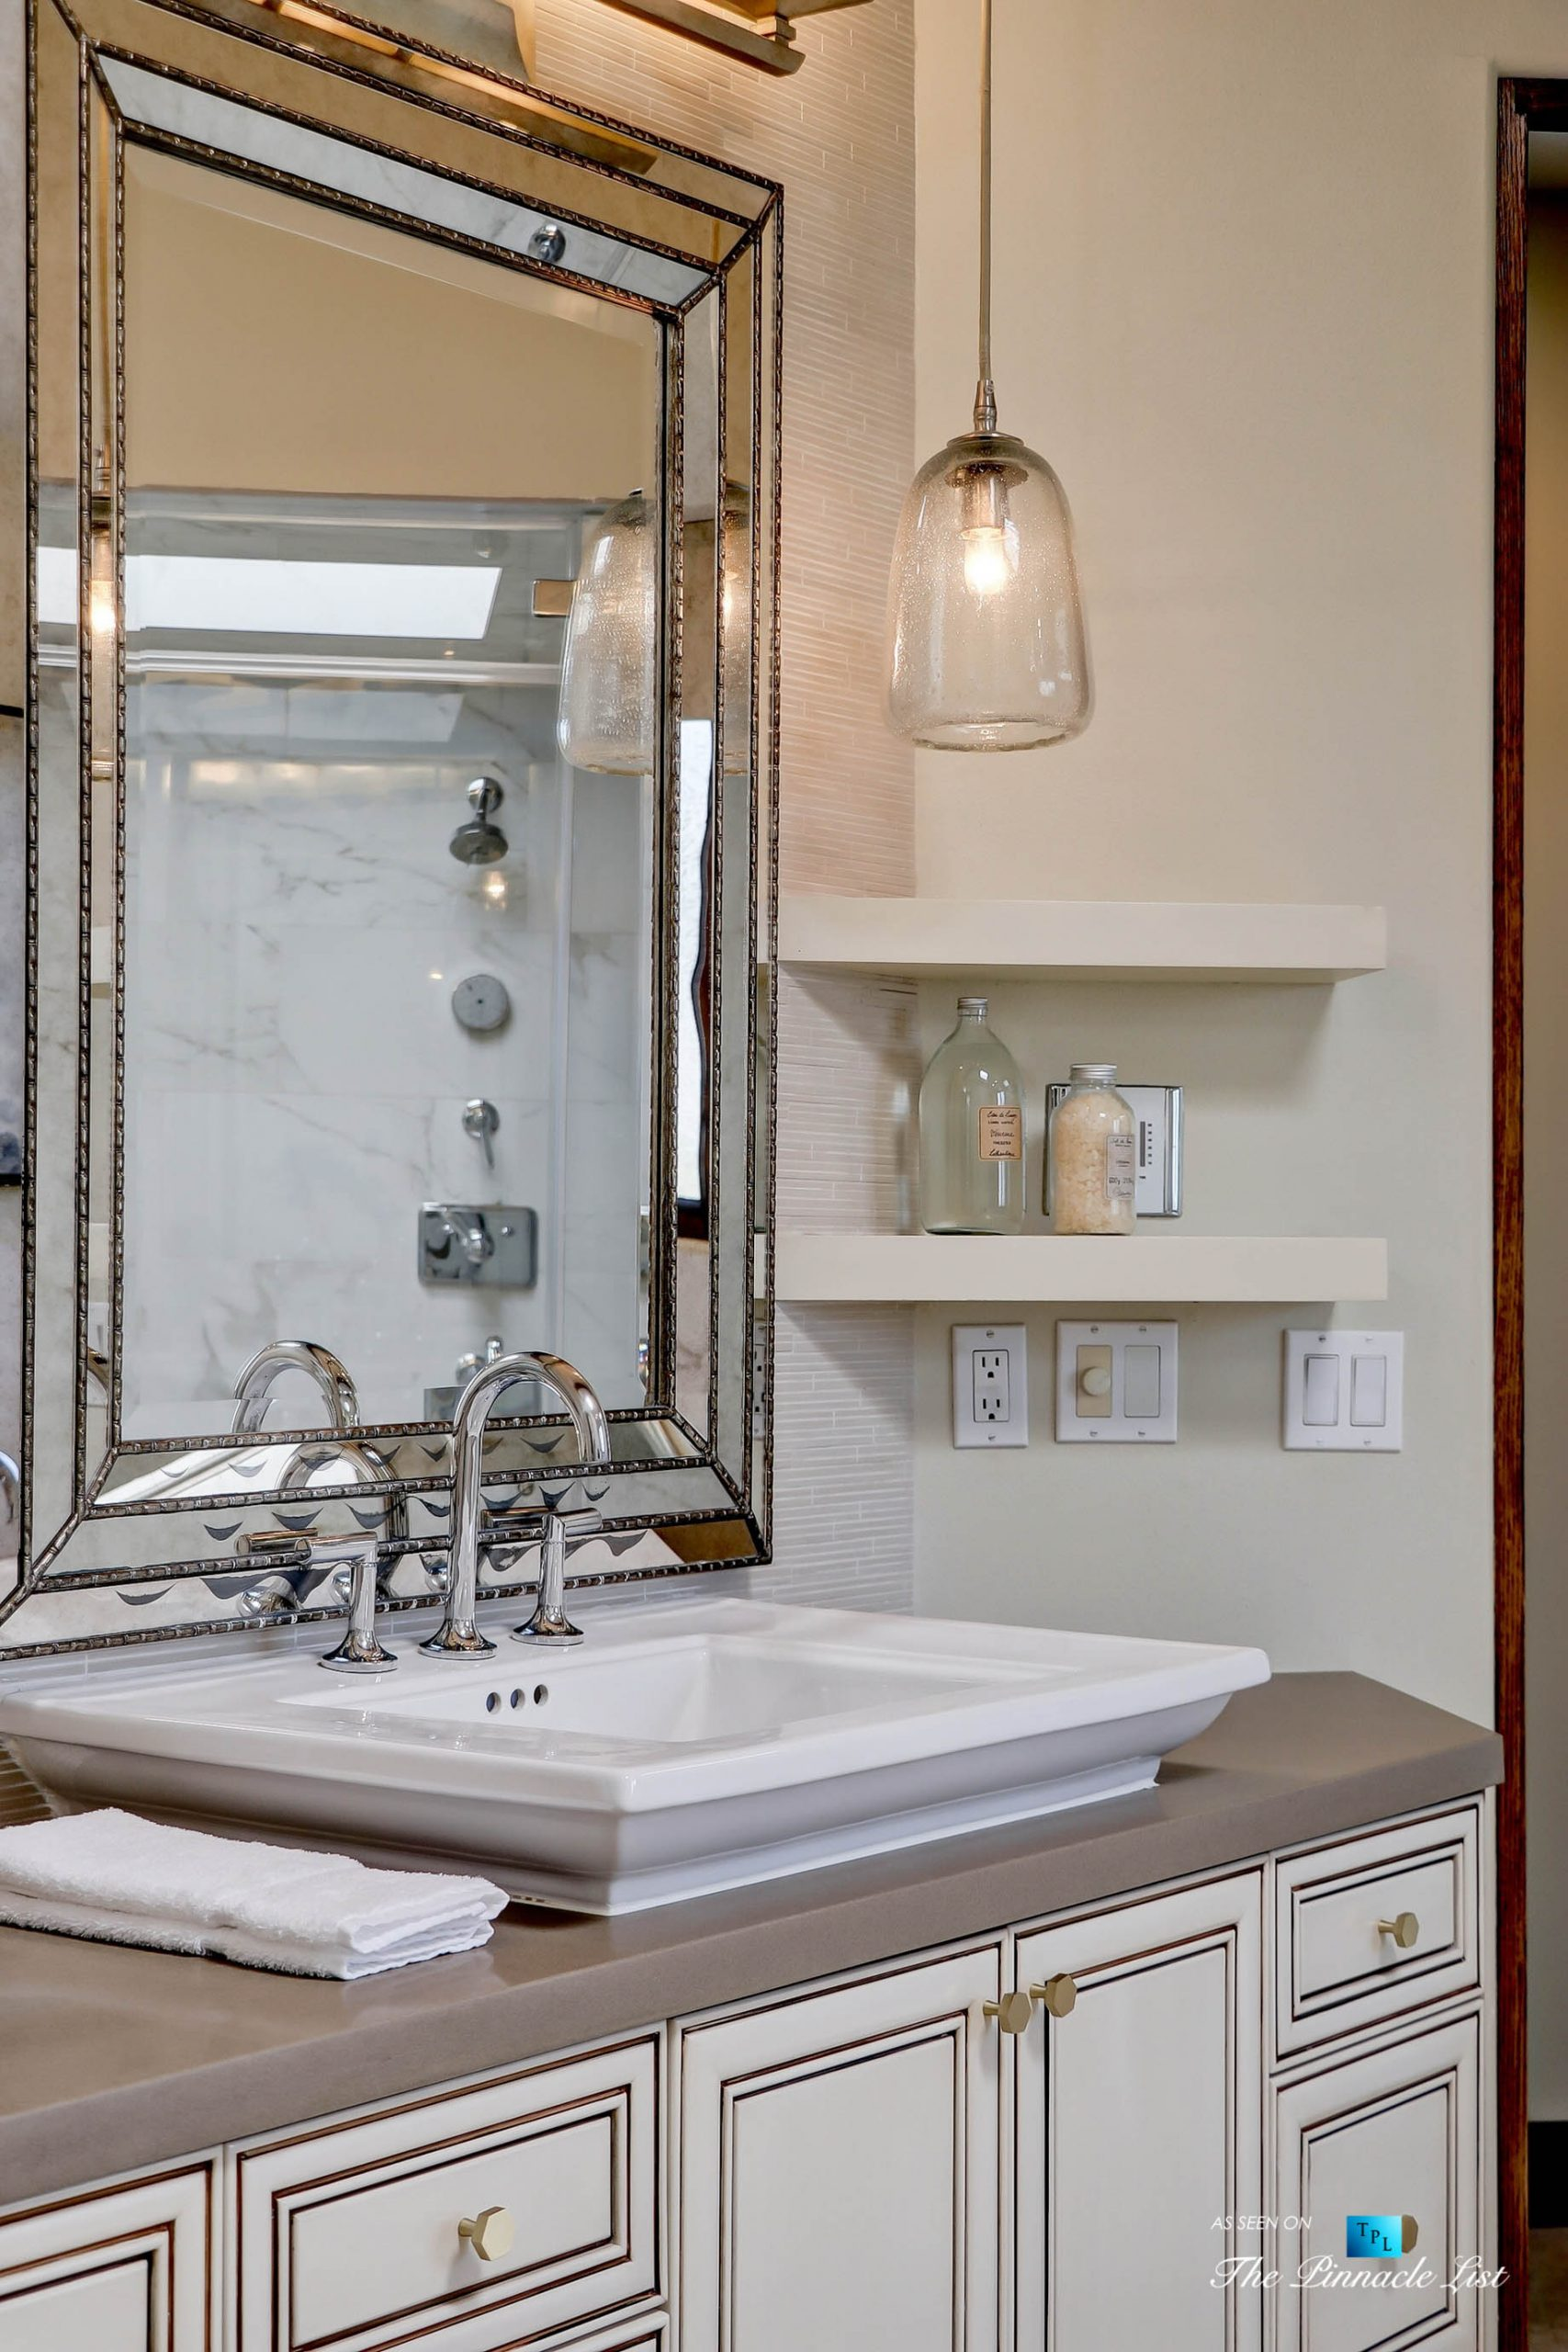 853 10th Street, Manhattan Beach, CA, USA – Master Bathroom Sink